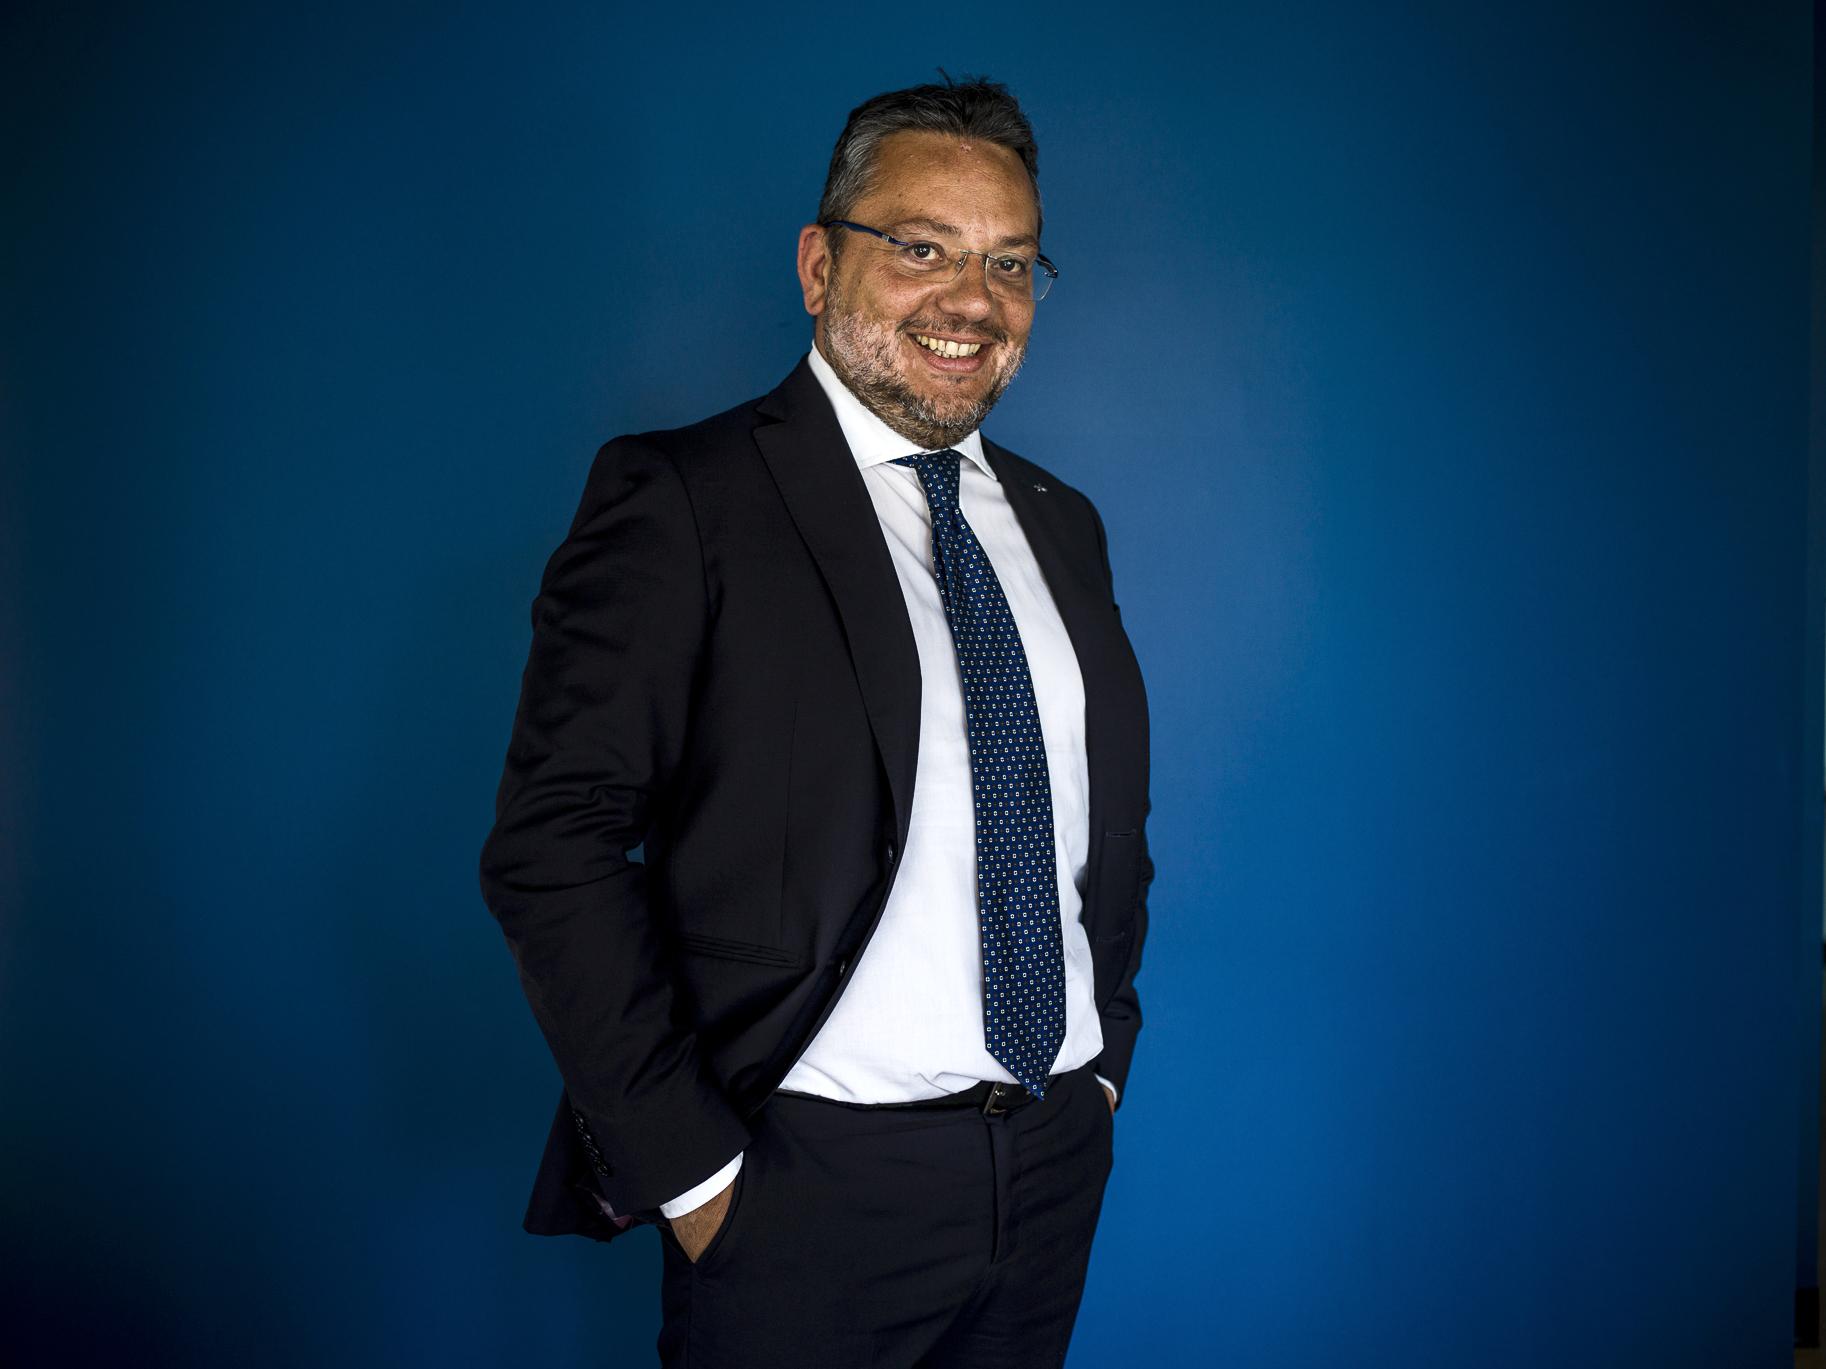 Fernando_Diana_CEO_Citynews-2